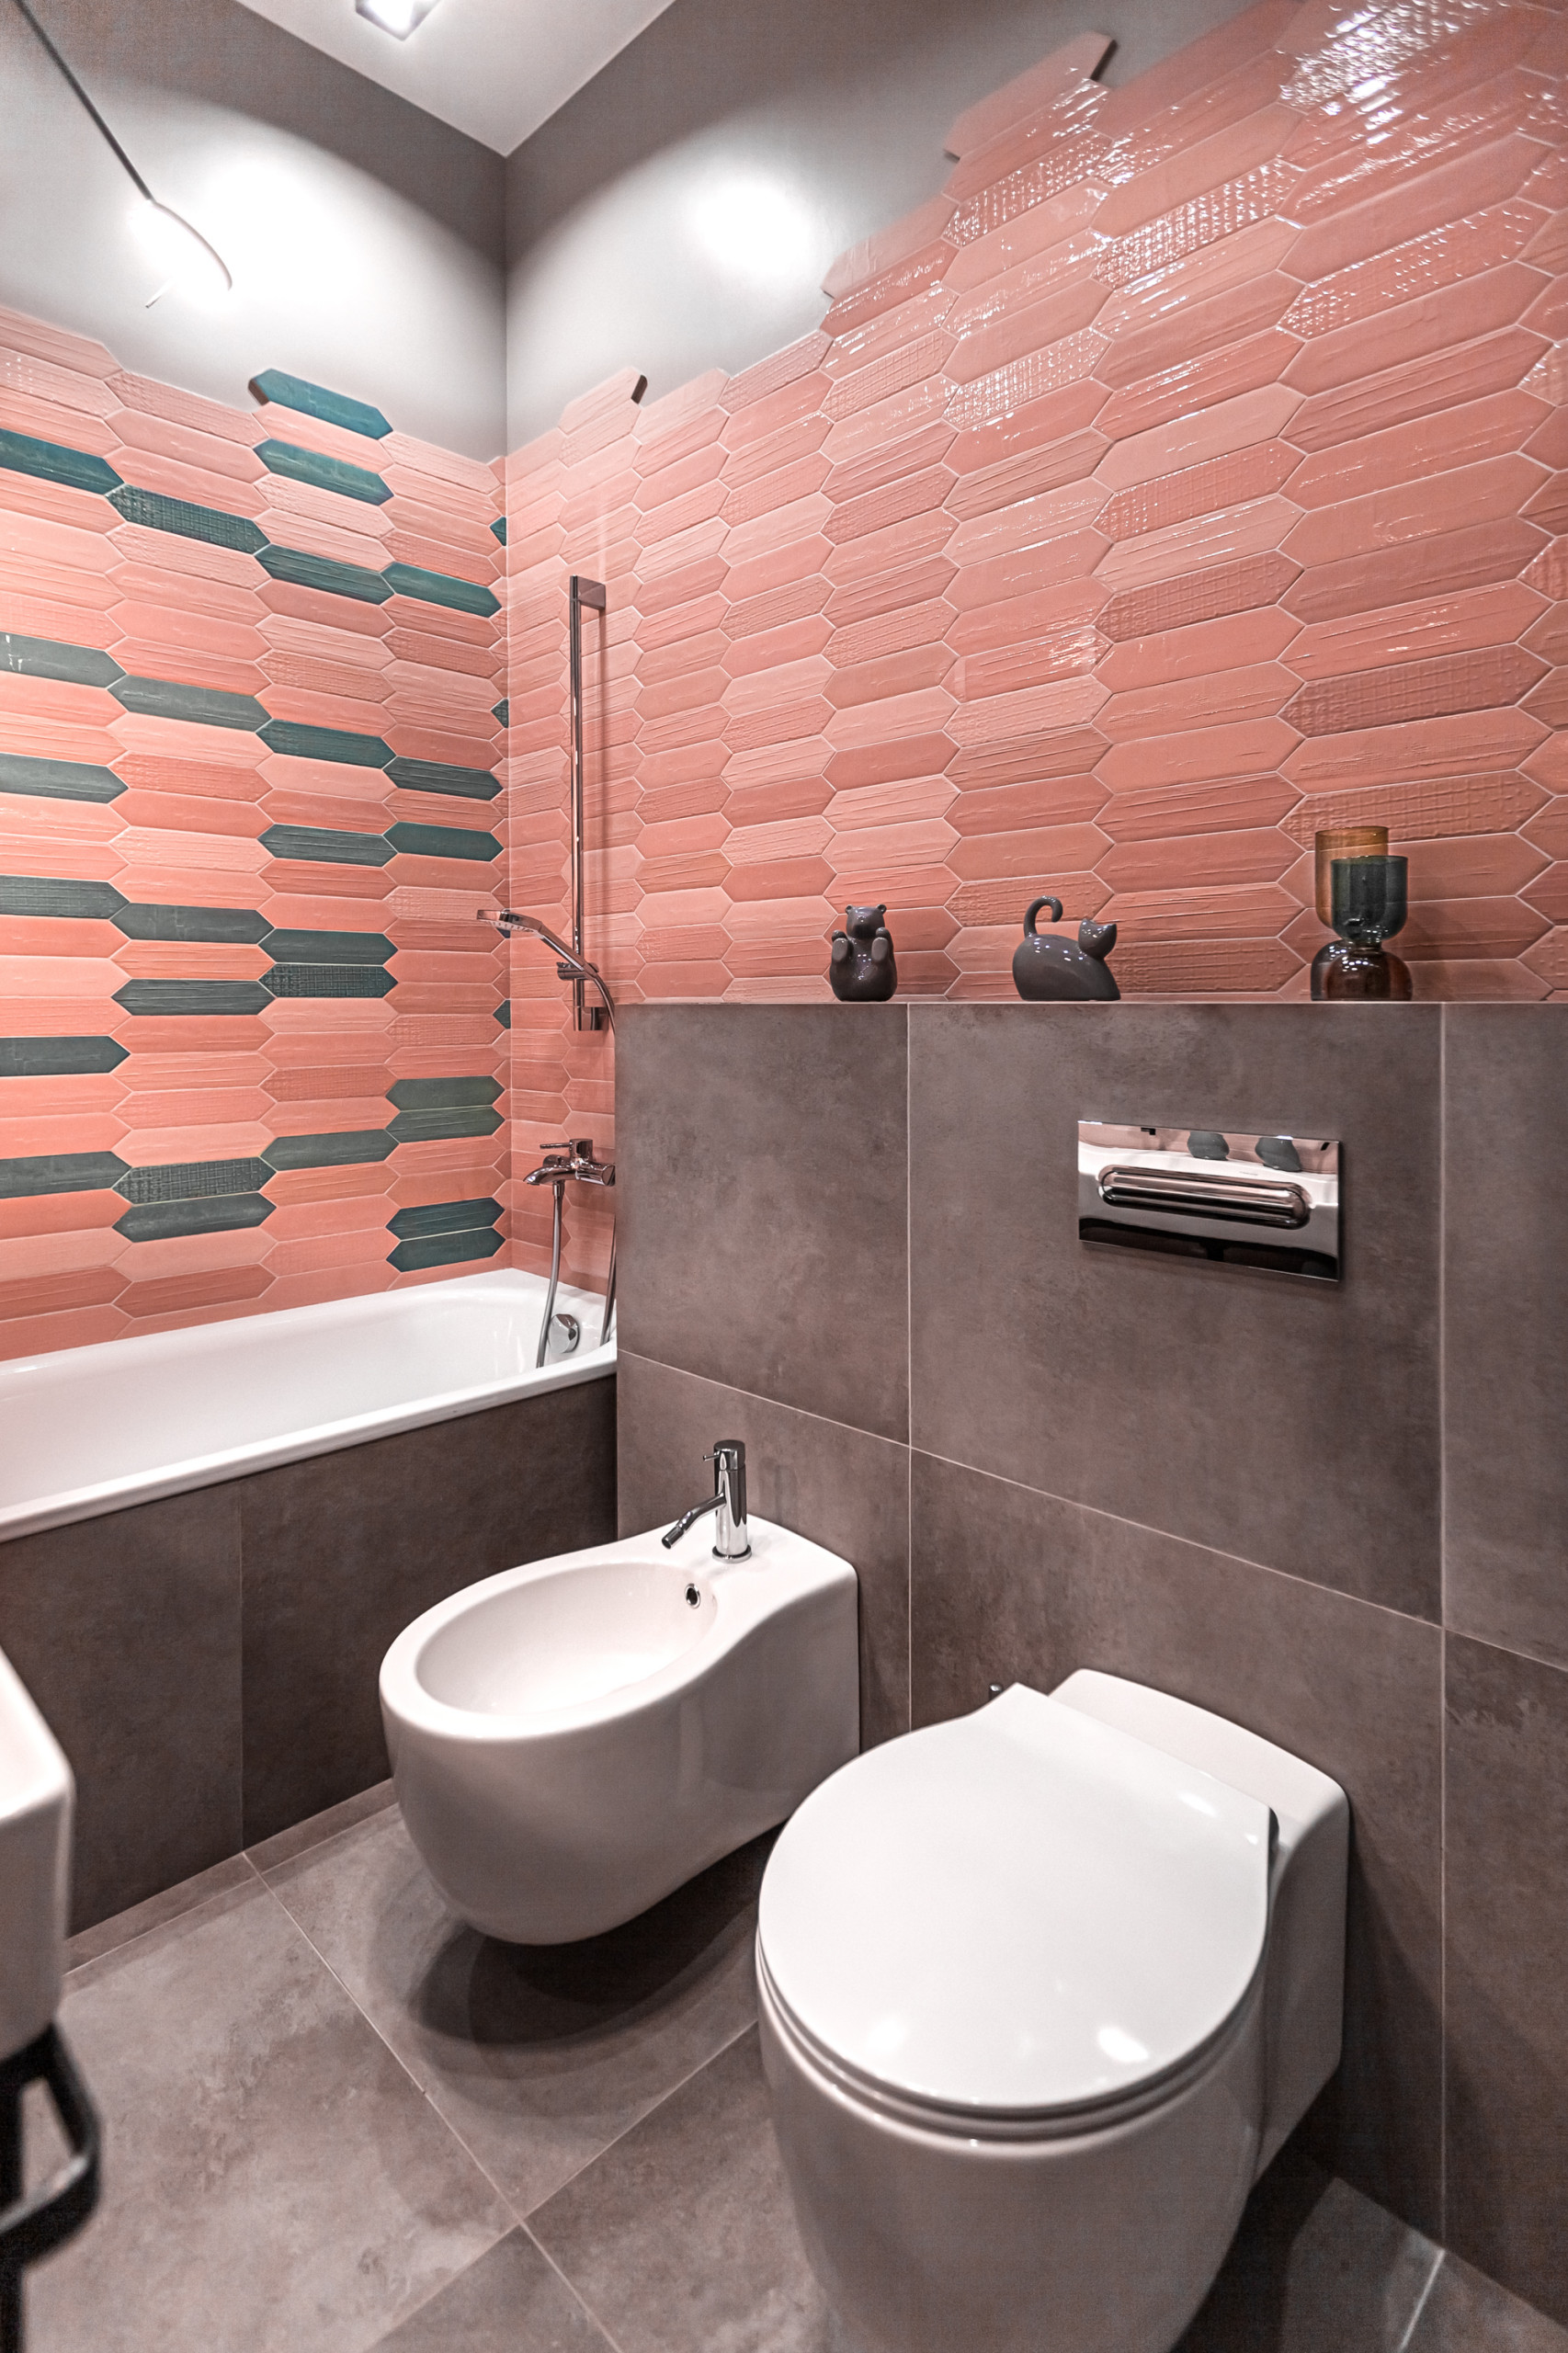 Ванная комната с розовыми стенами в стиле фьюжн